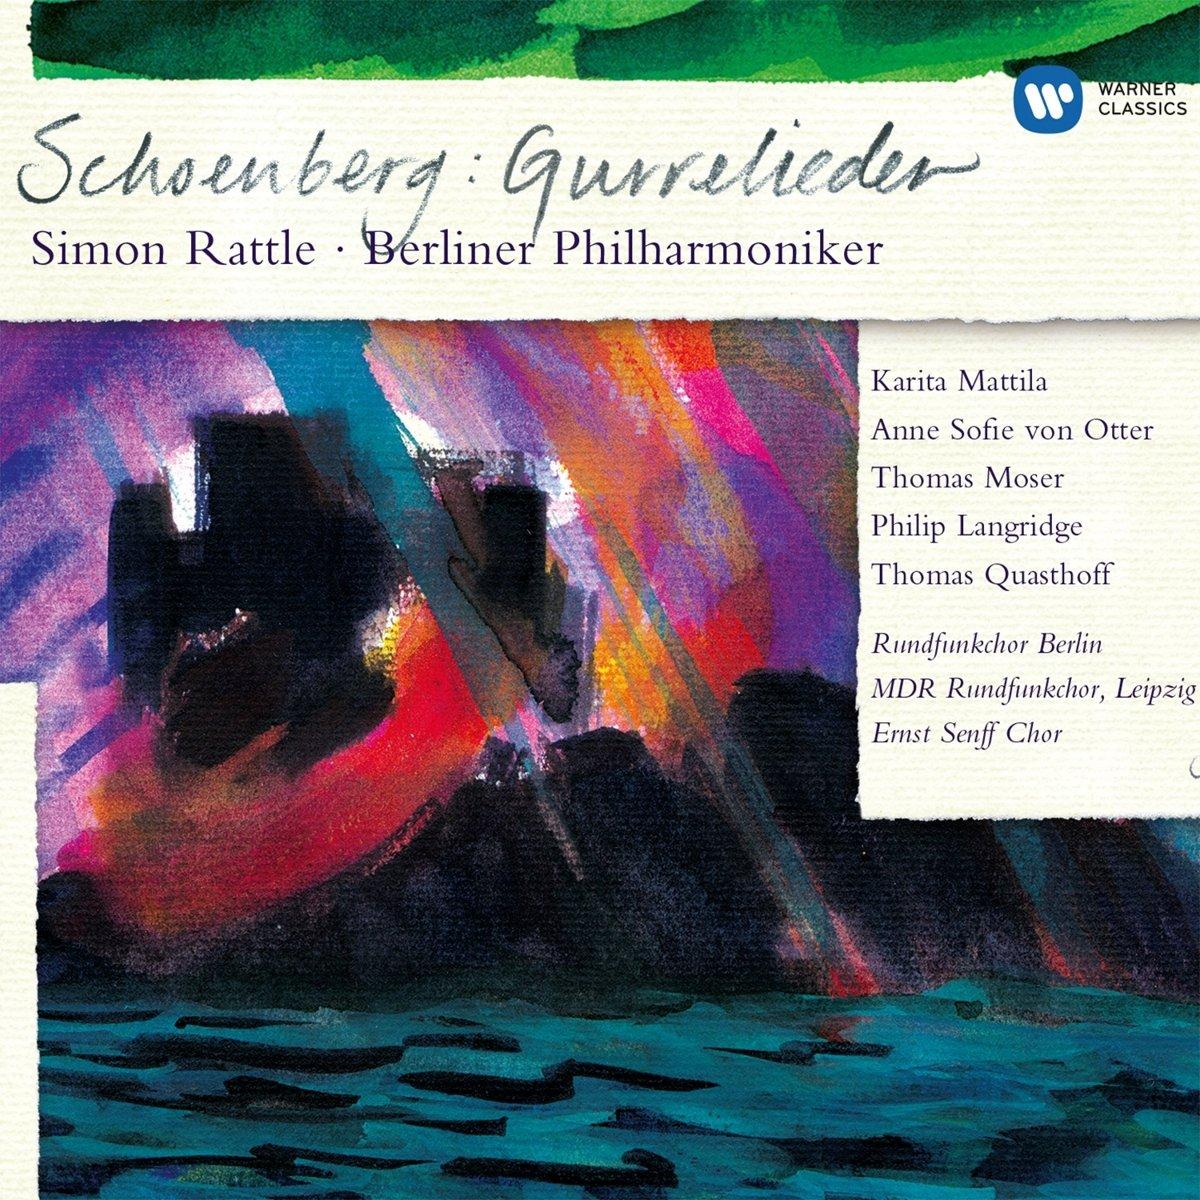 Schoenberg: Gurrelieder; Sir Simon Rattle; Berlin Philharmonic & soloists by EMI Classics